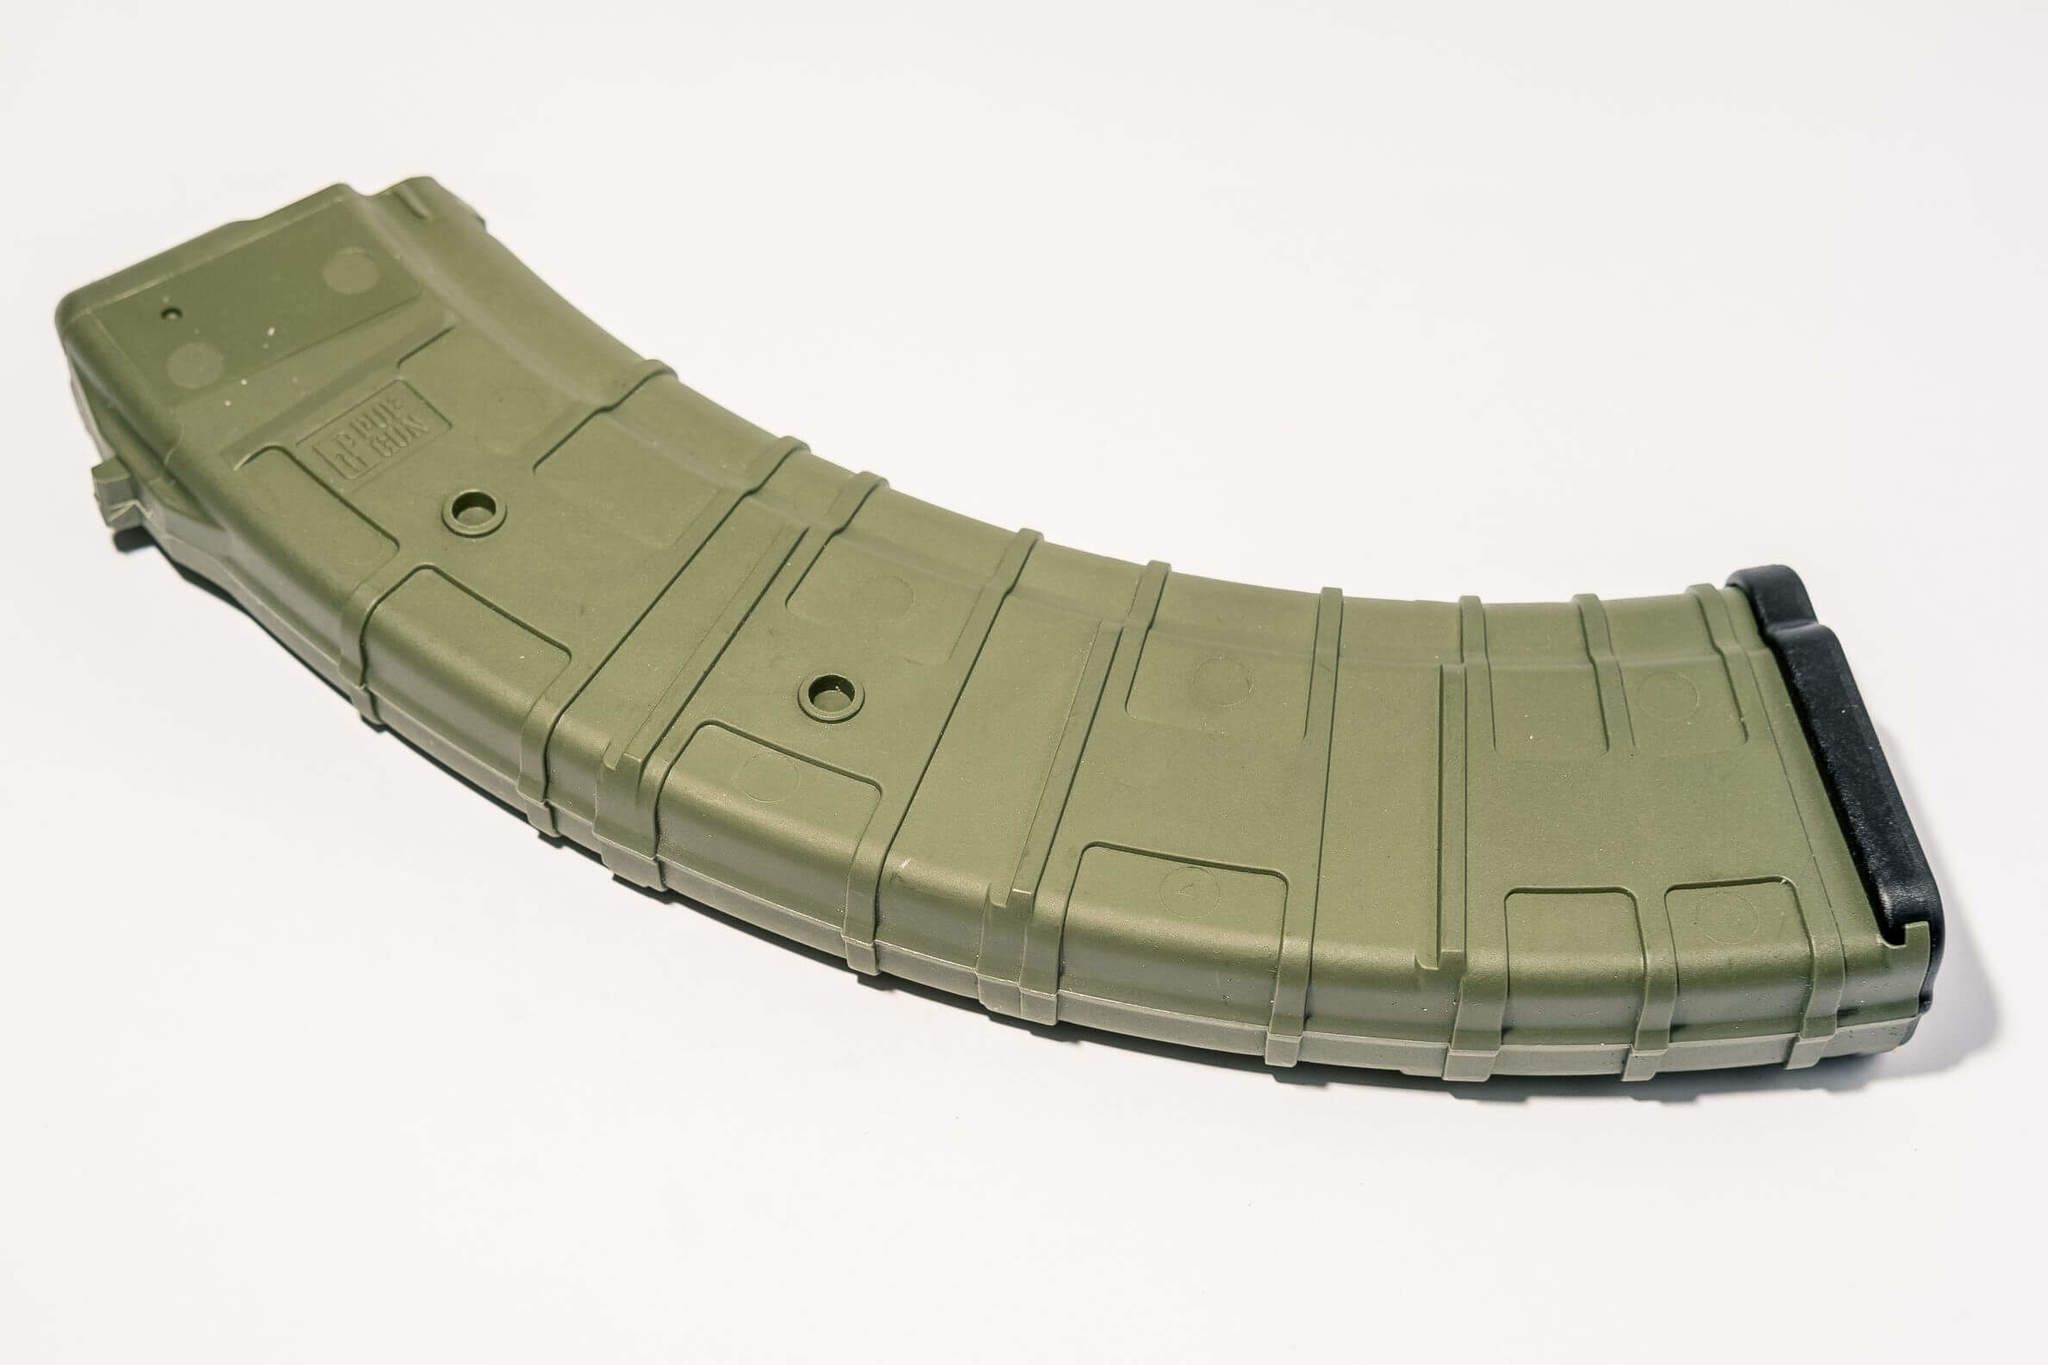 Магазин Pufgun для  ВПО-136 ВПО-209 7.62x39 на 40 патронов, цвет олива